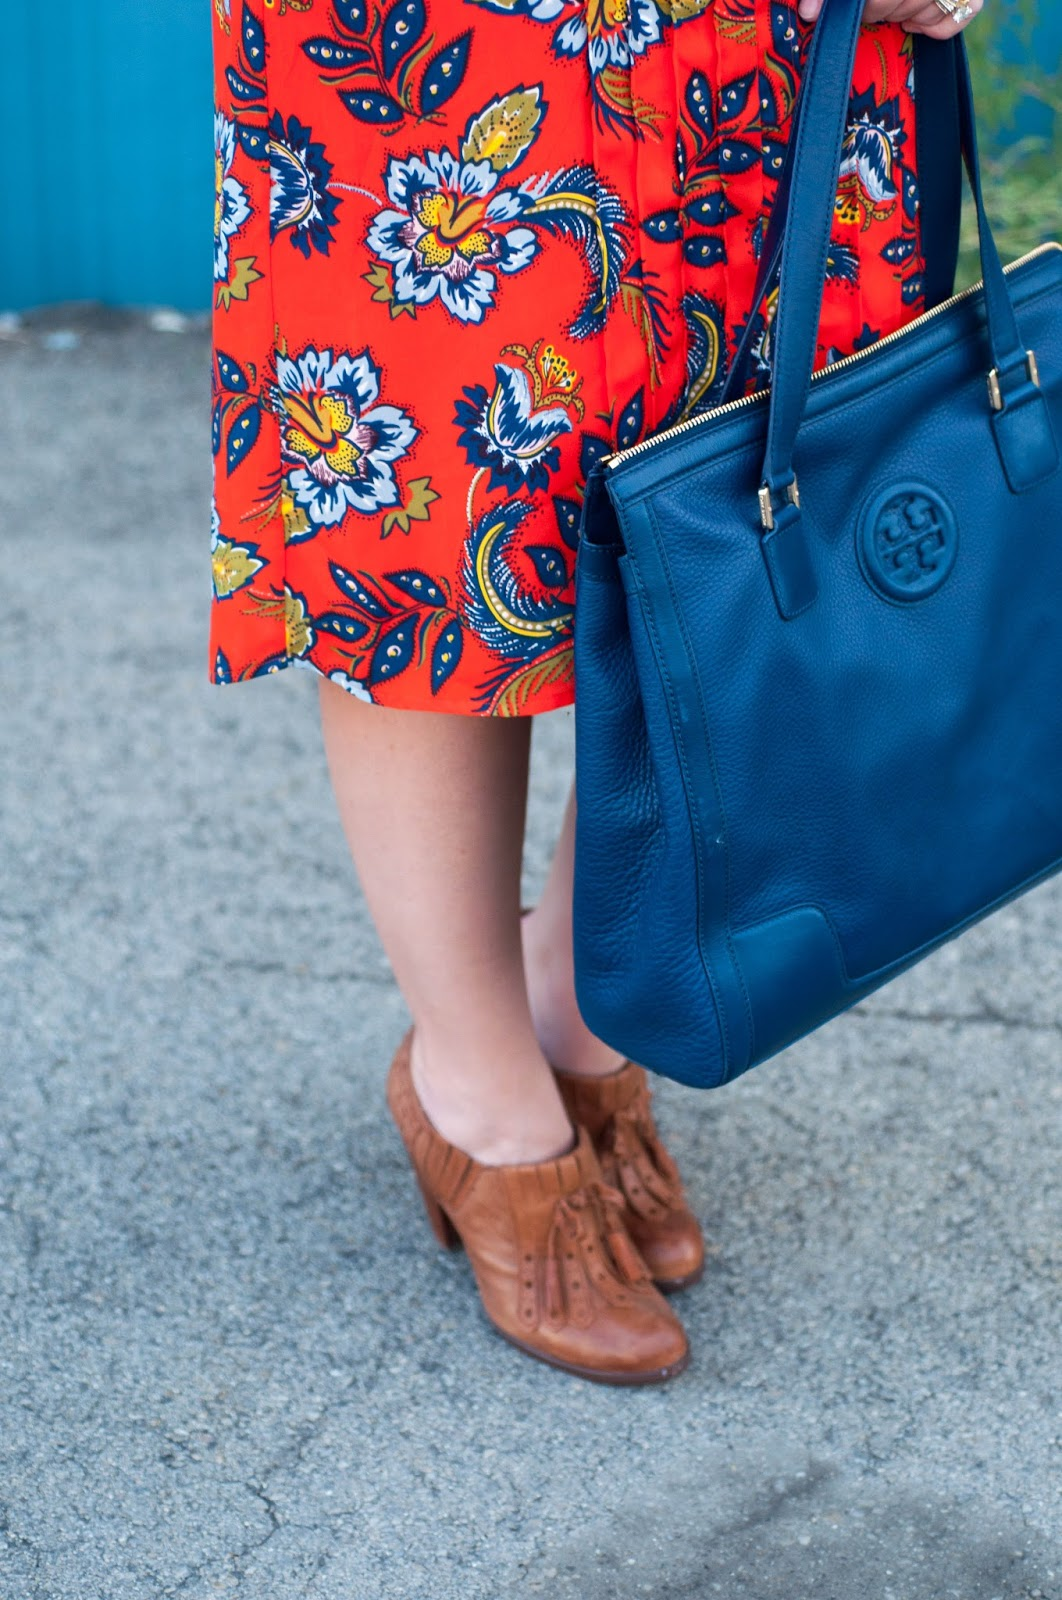 paisley print, tory burch handbag, tory burch hannah tote, navy leather, ootd, seychelles heels